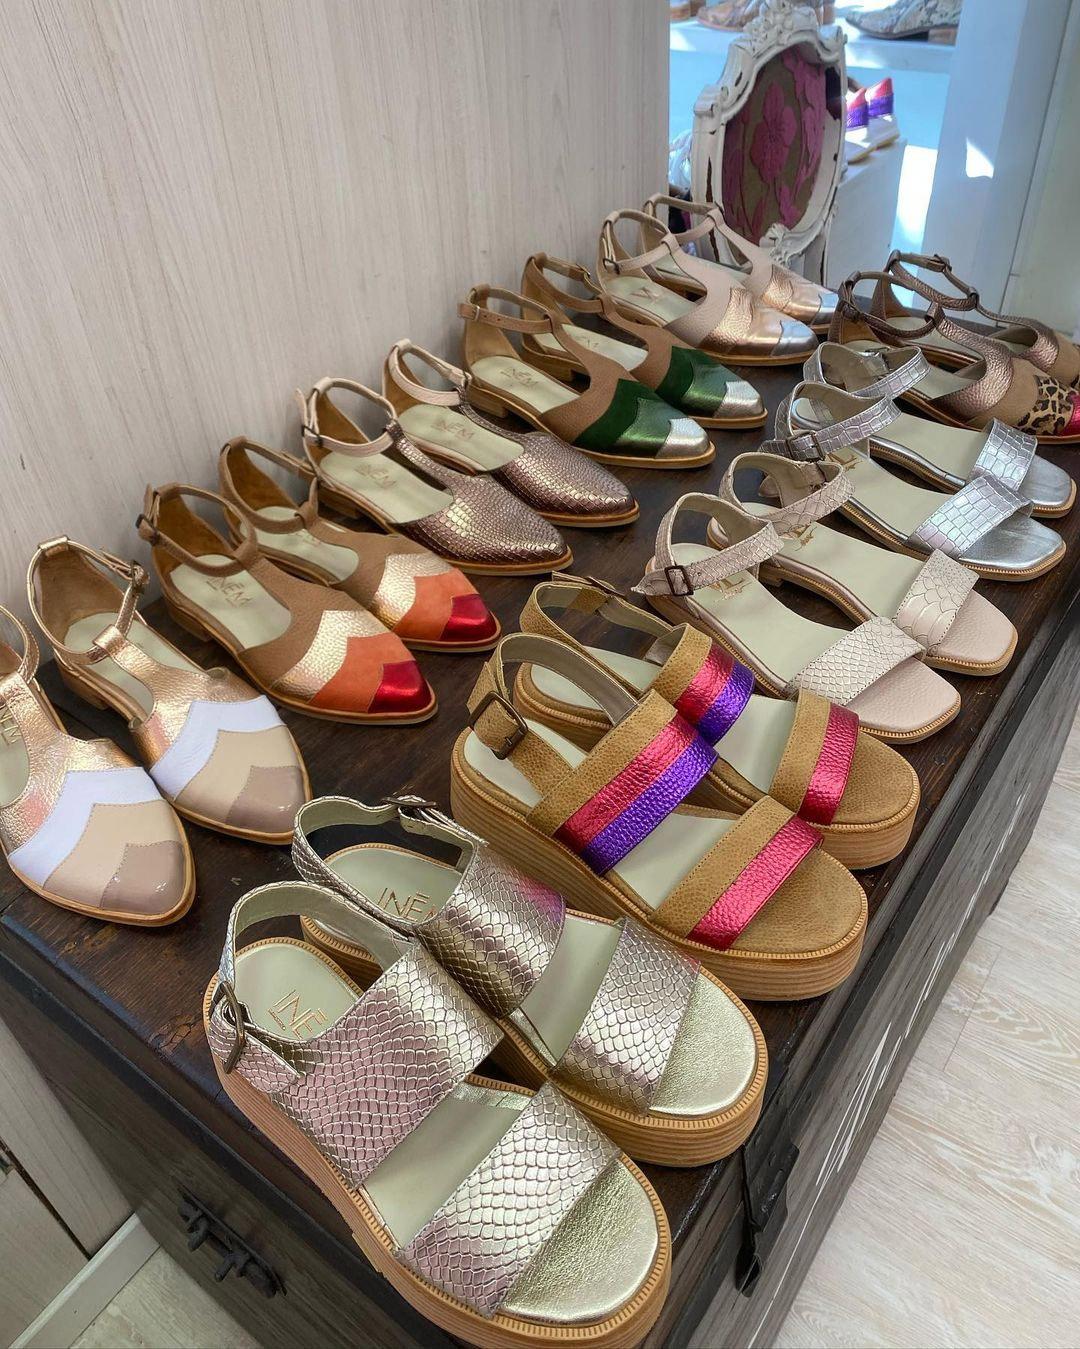 sandalias de cuero en palermo 2021